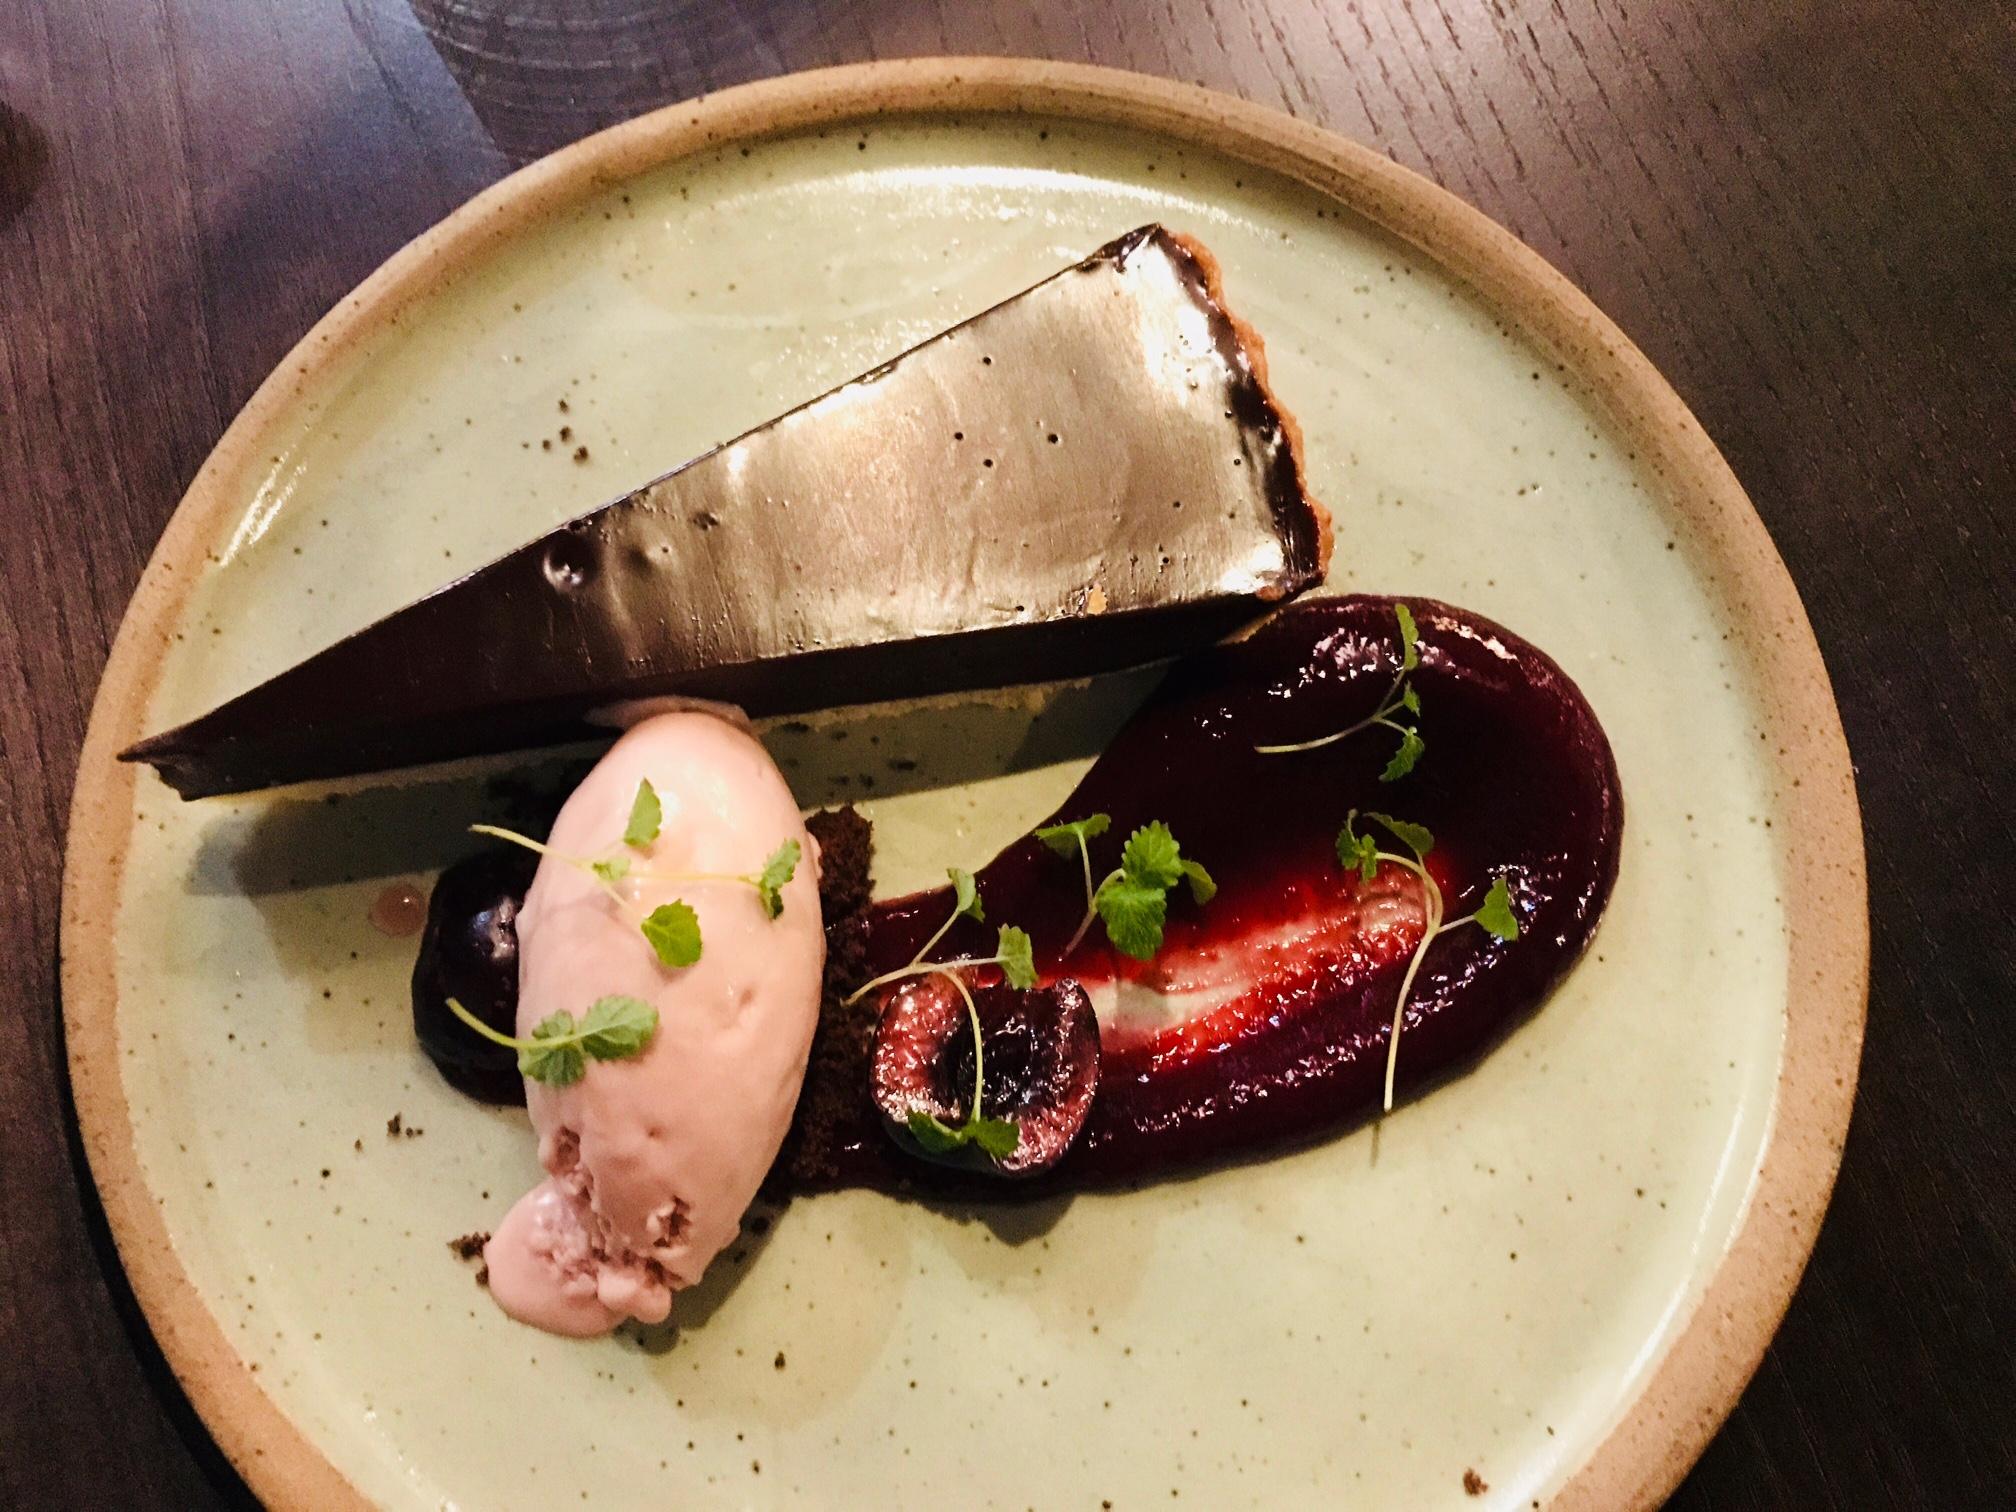 Wood Manchester - chocolate tart